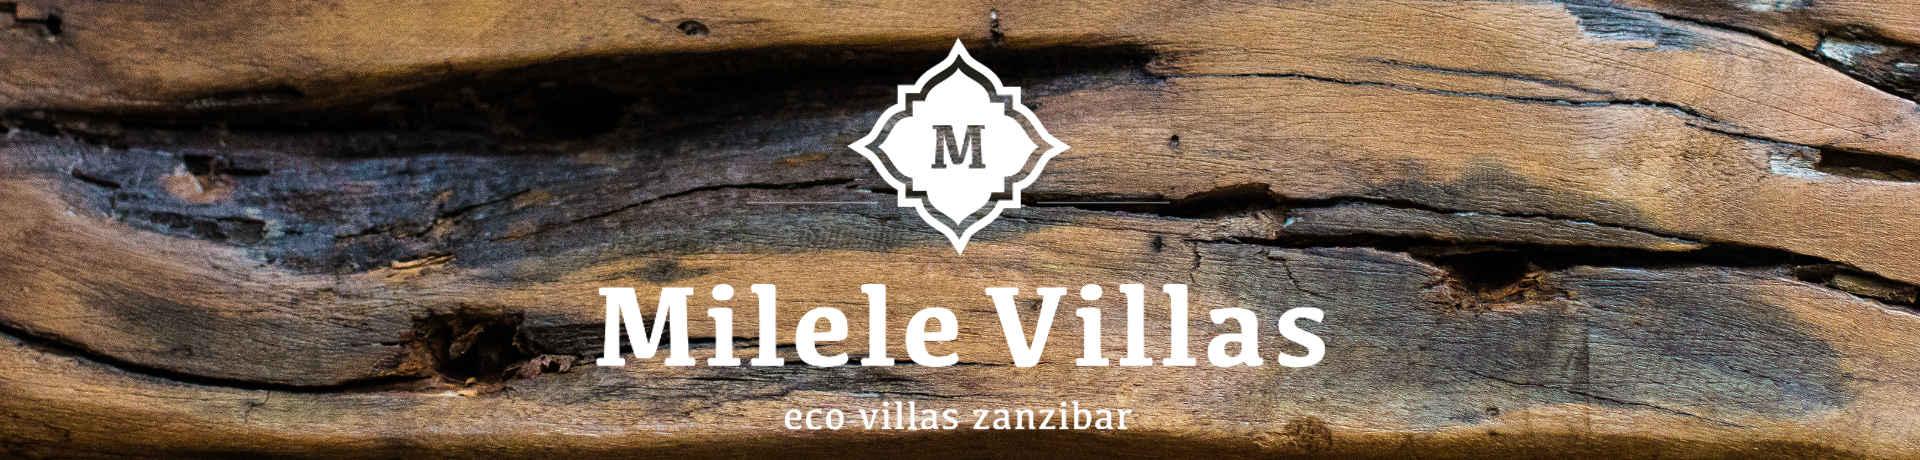 Milele Villas - Private Strand Villa Sansibar